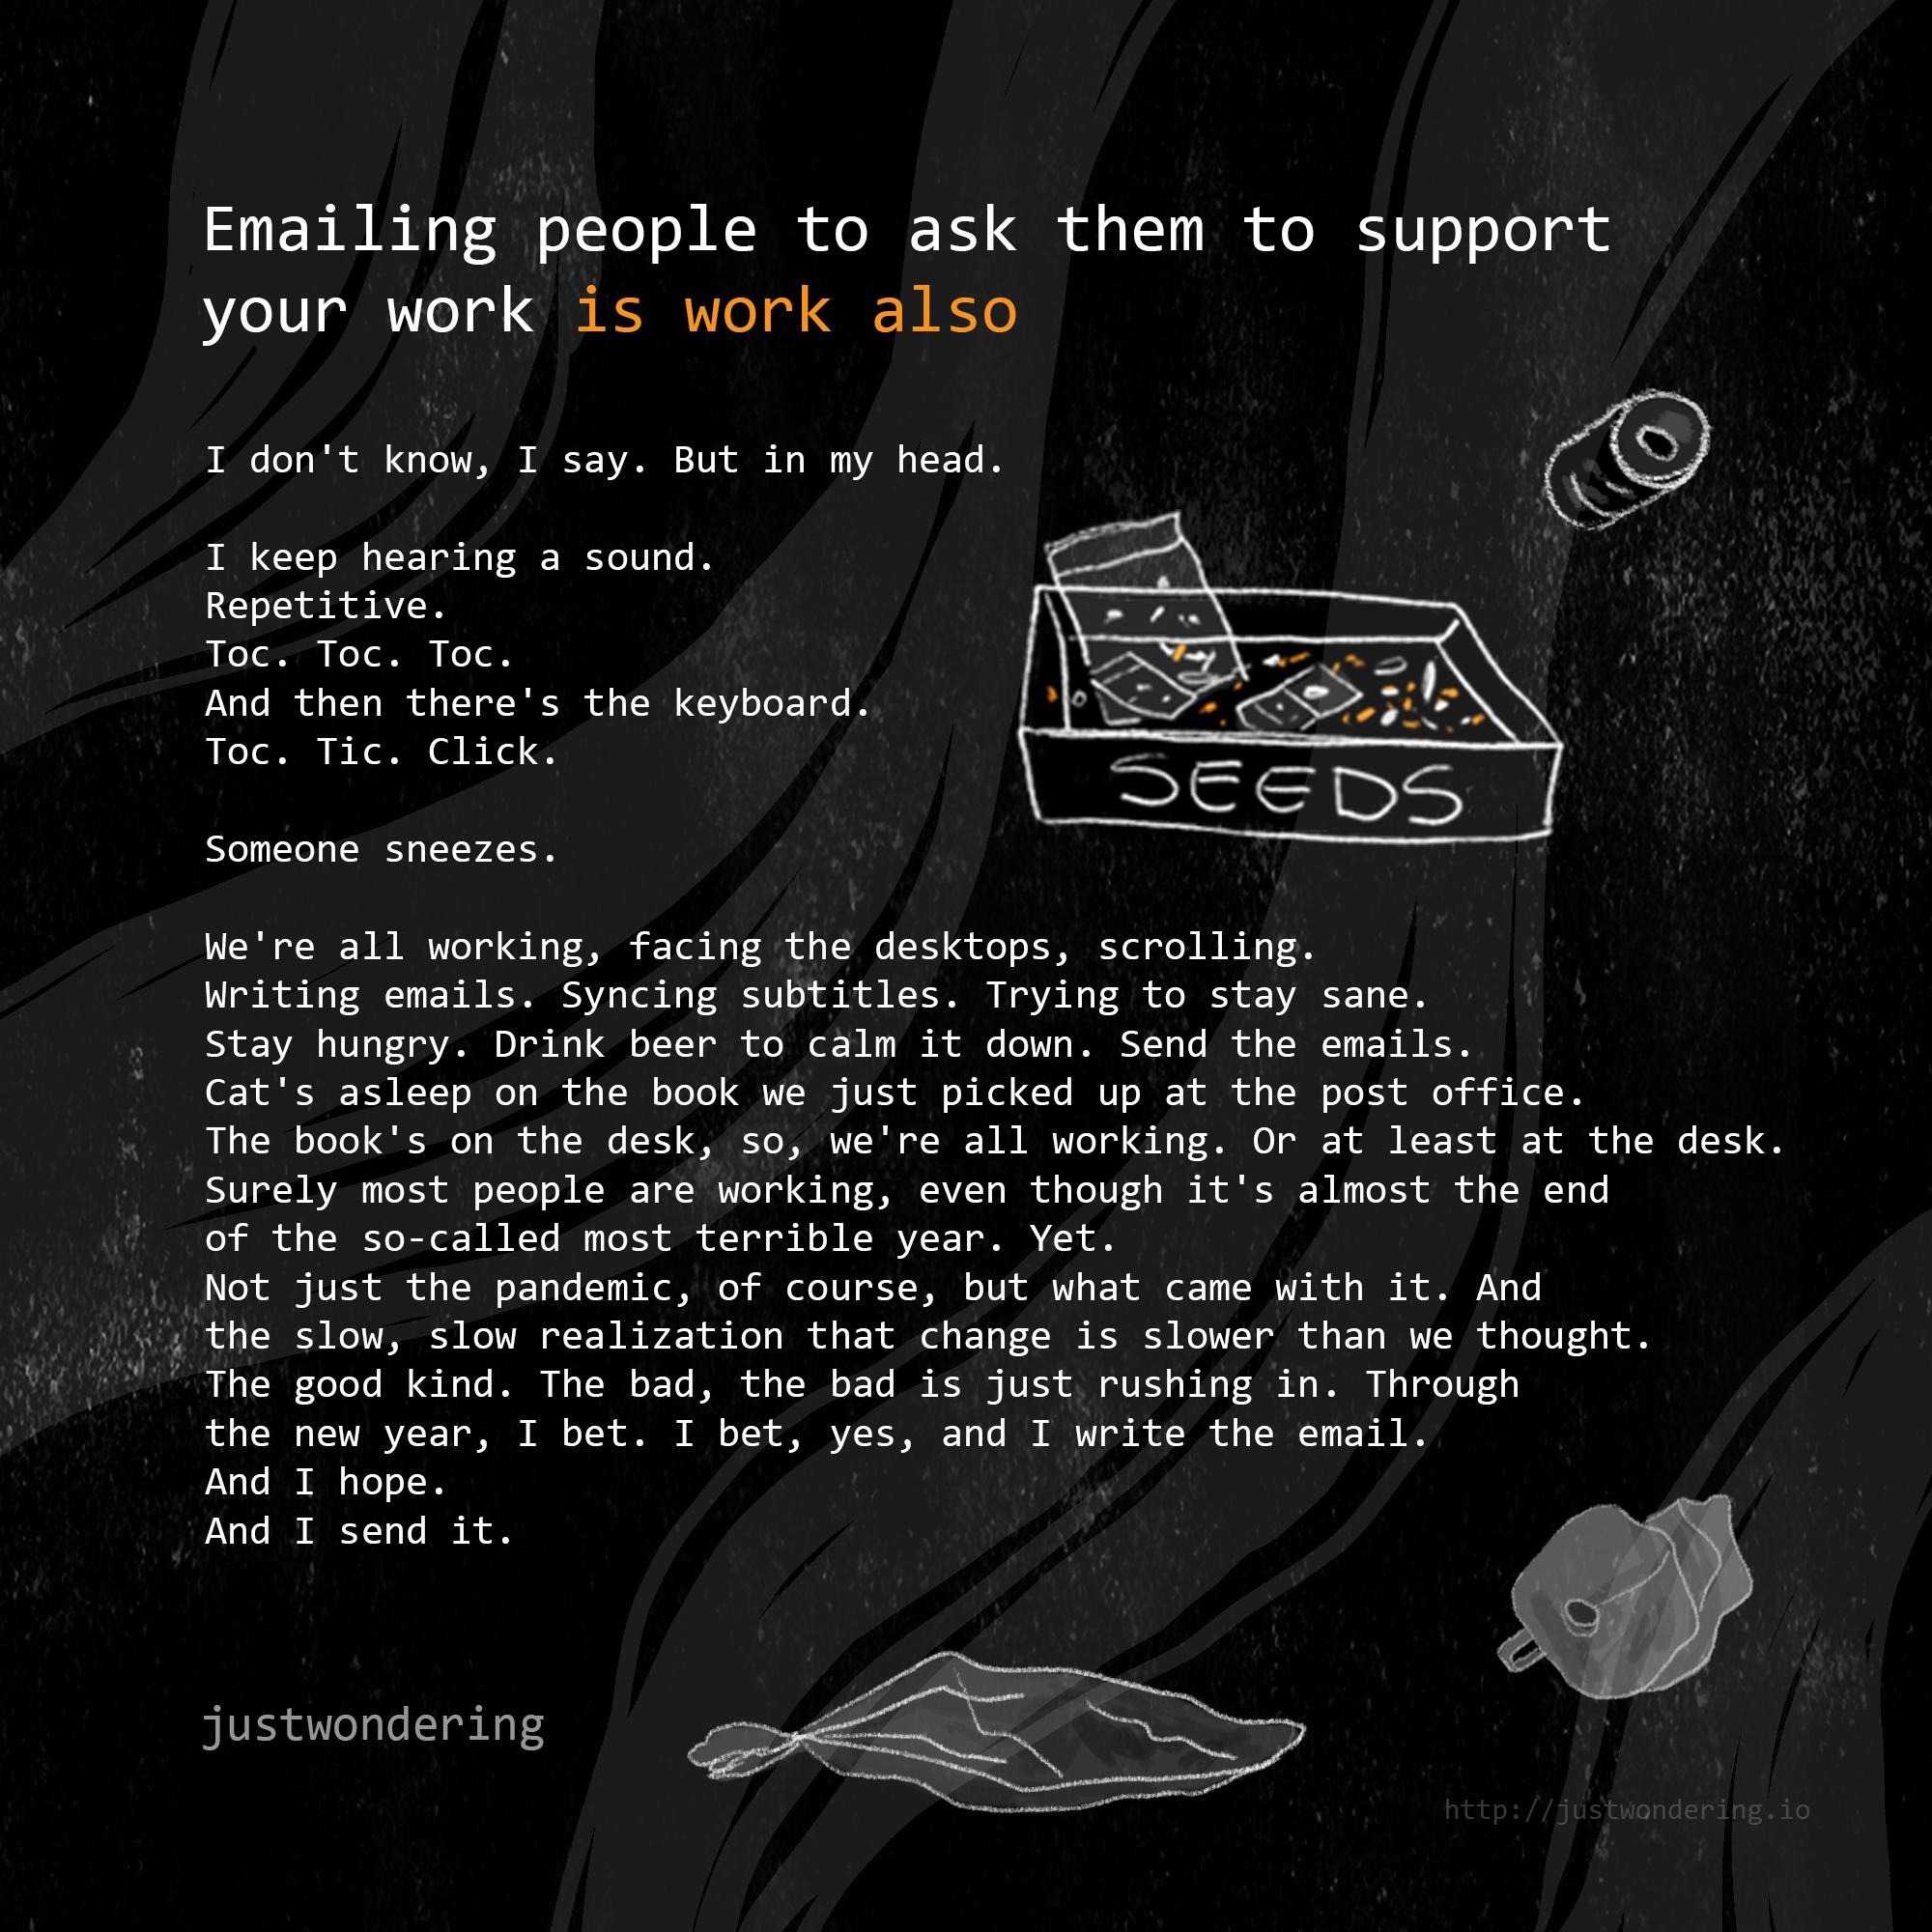 Poem-Emailing people